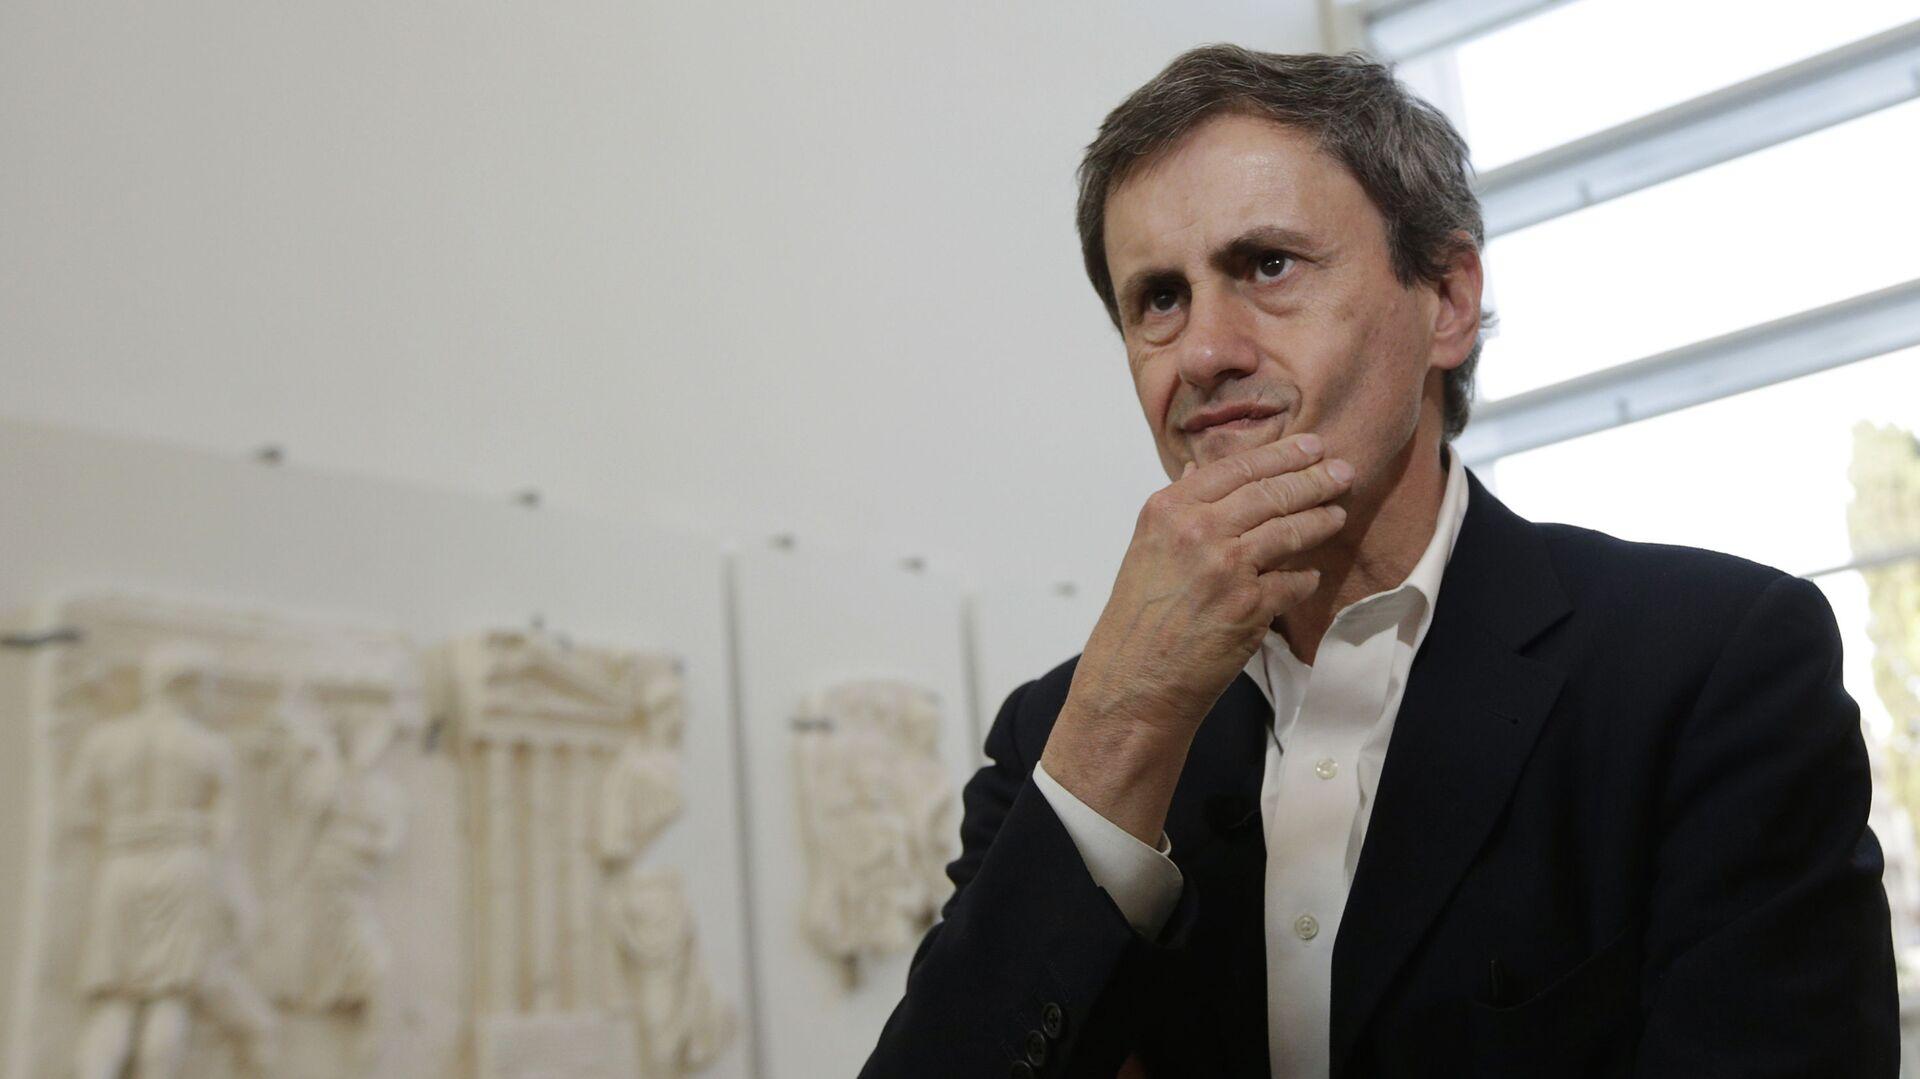 Gianni Alemanno, ex sindaco di Roma - Sputnik Italia, 1920, 08.07.2021